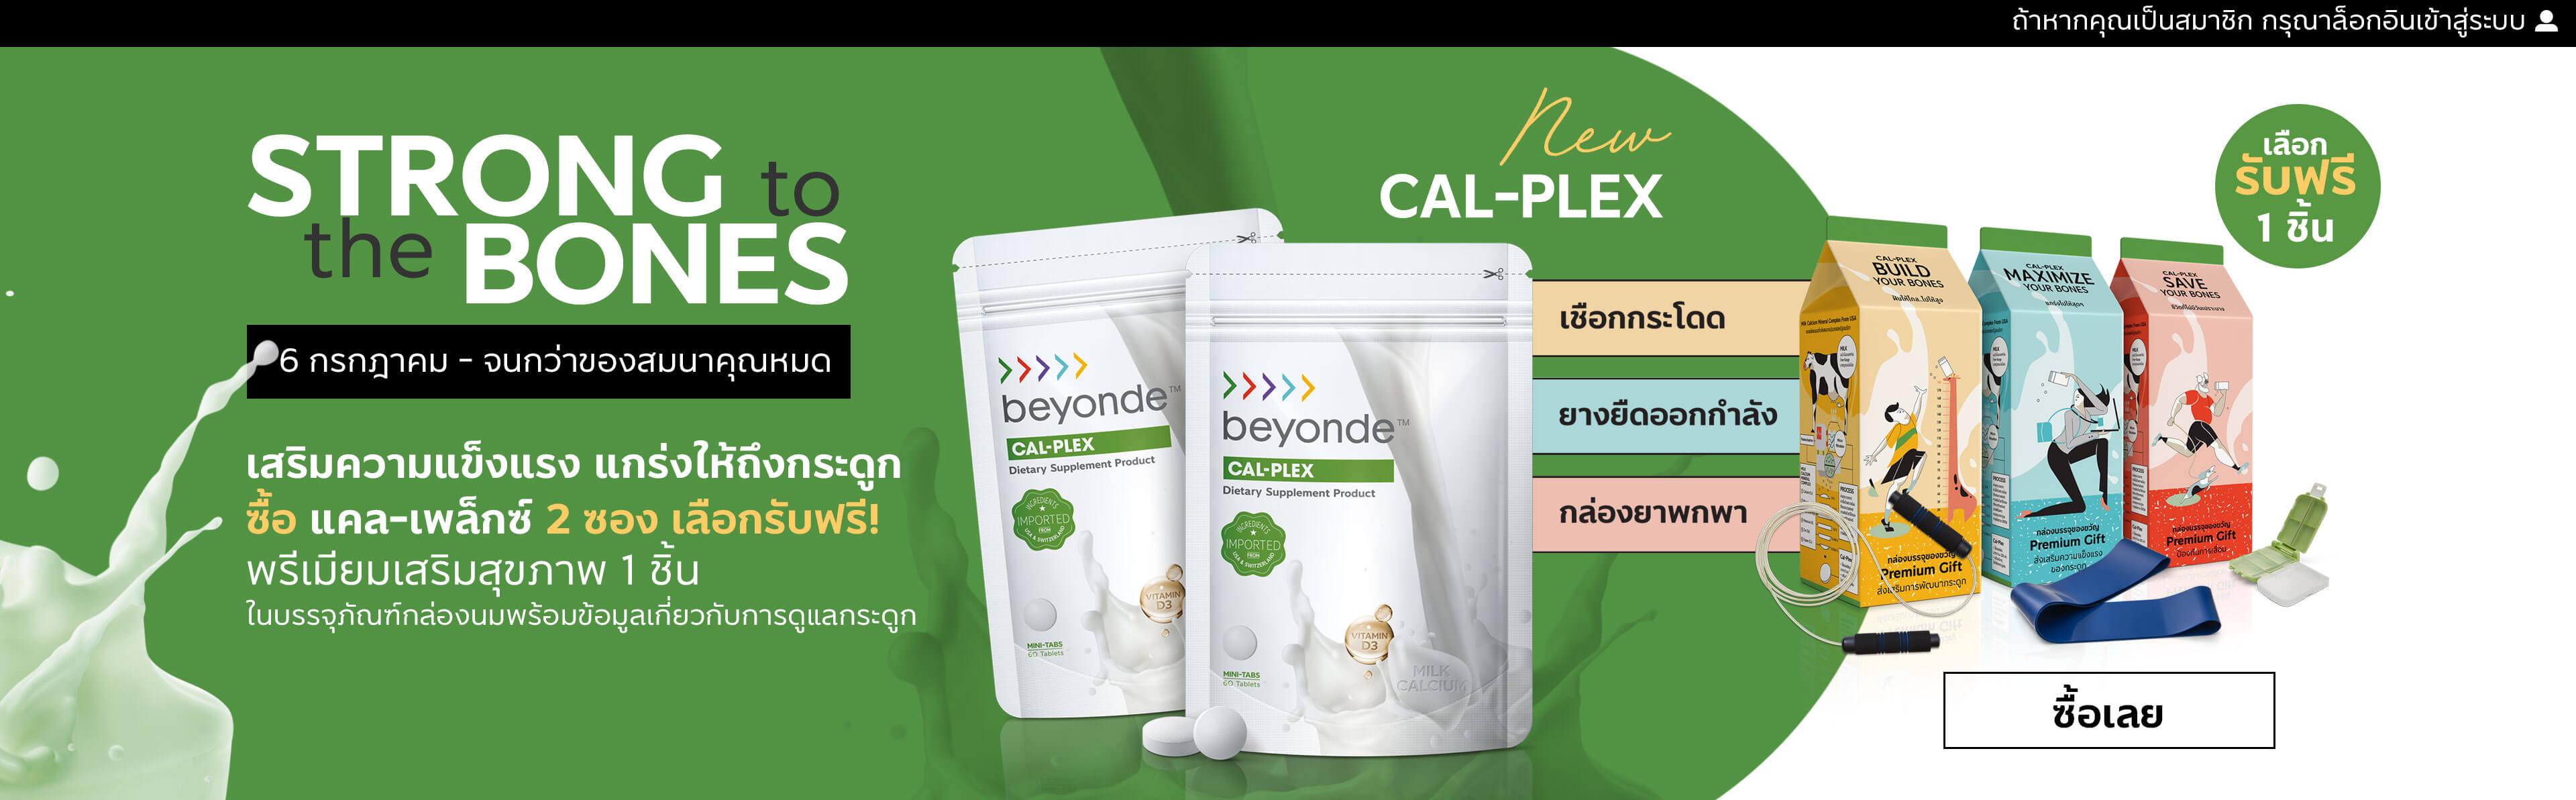 New beyonde Cal-Plex Special Set